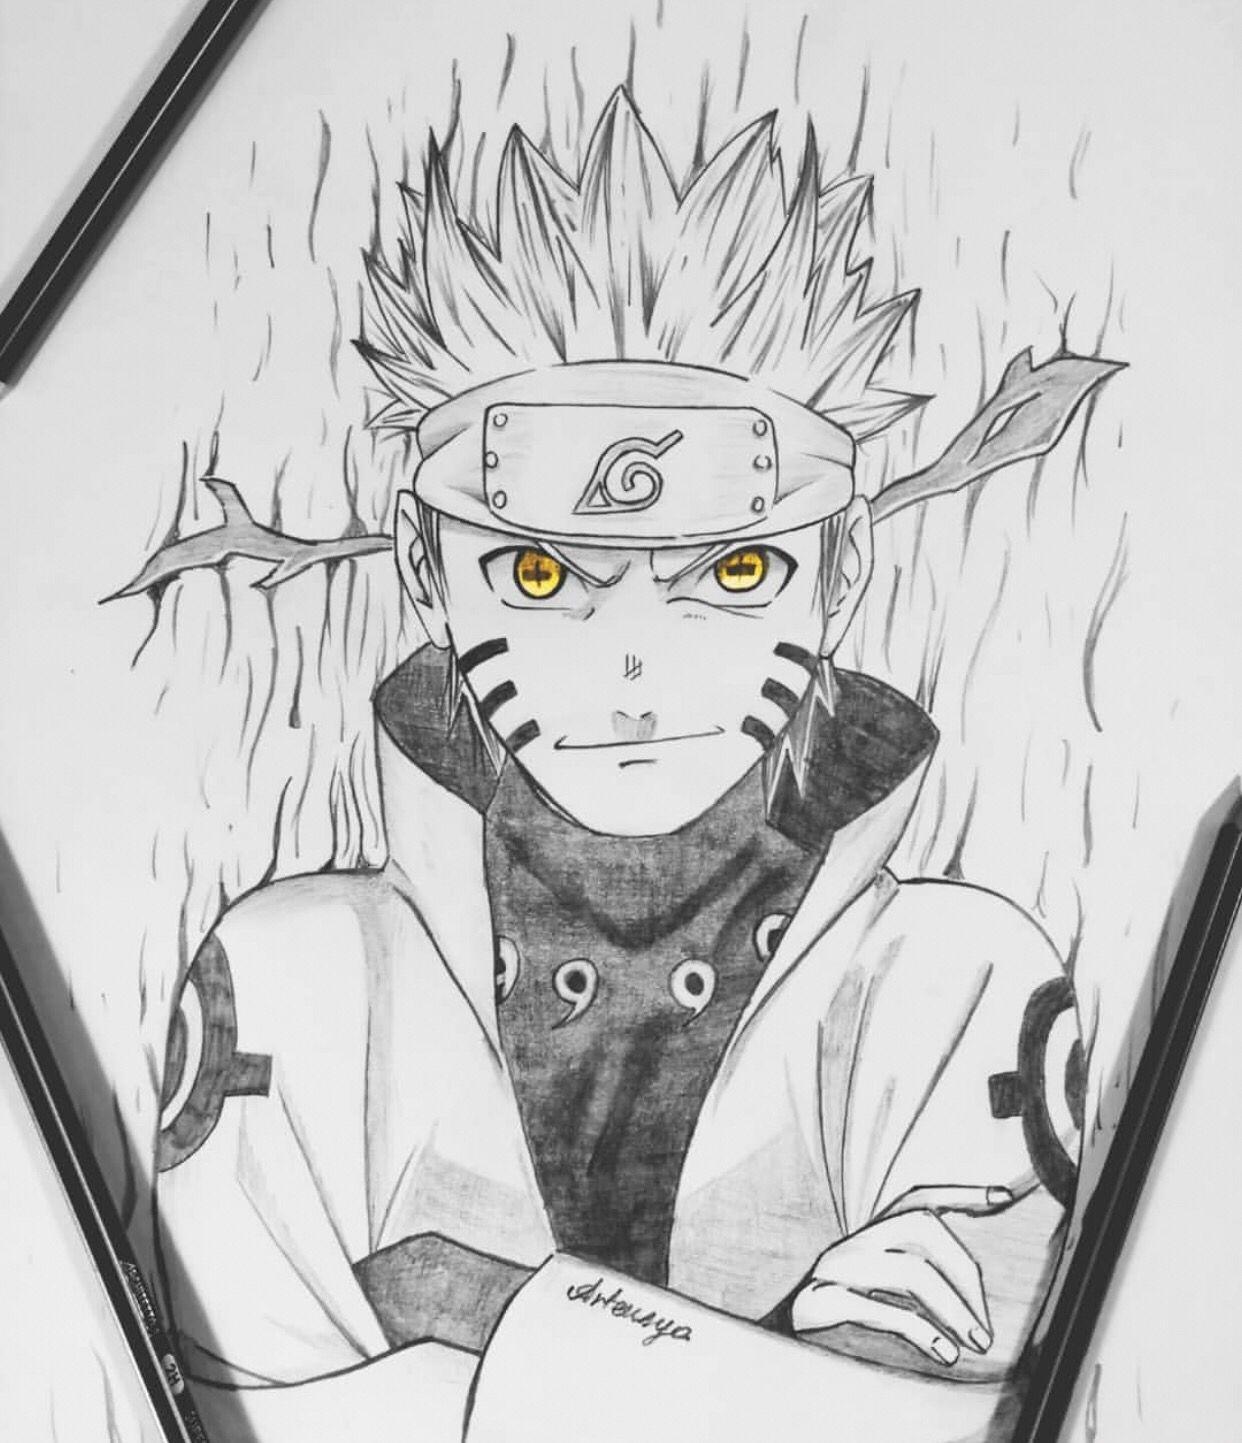 Anime Ignite Igniteartistscorner Artensya Check It Out Here Anime Ignite This Amazing Artist C Naruto Sketch Naruto Sketch Drawing Naruto Drawings